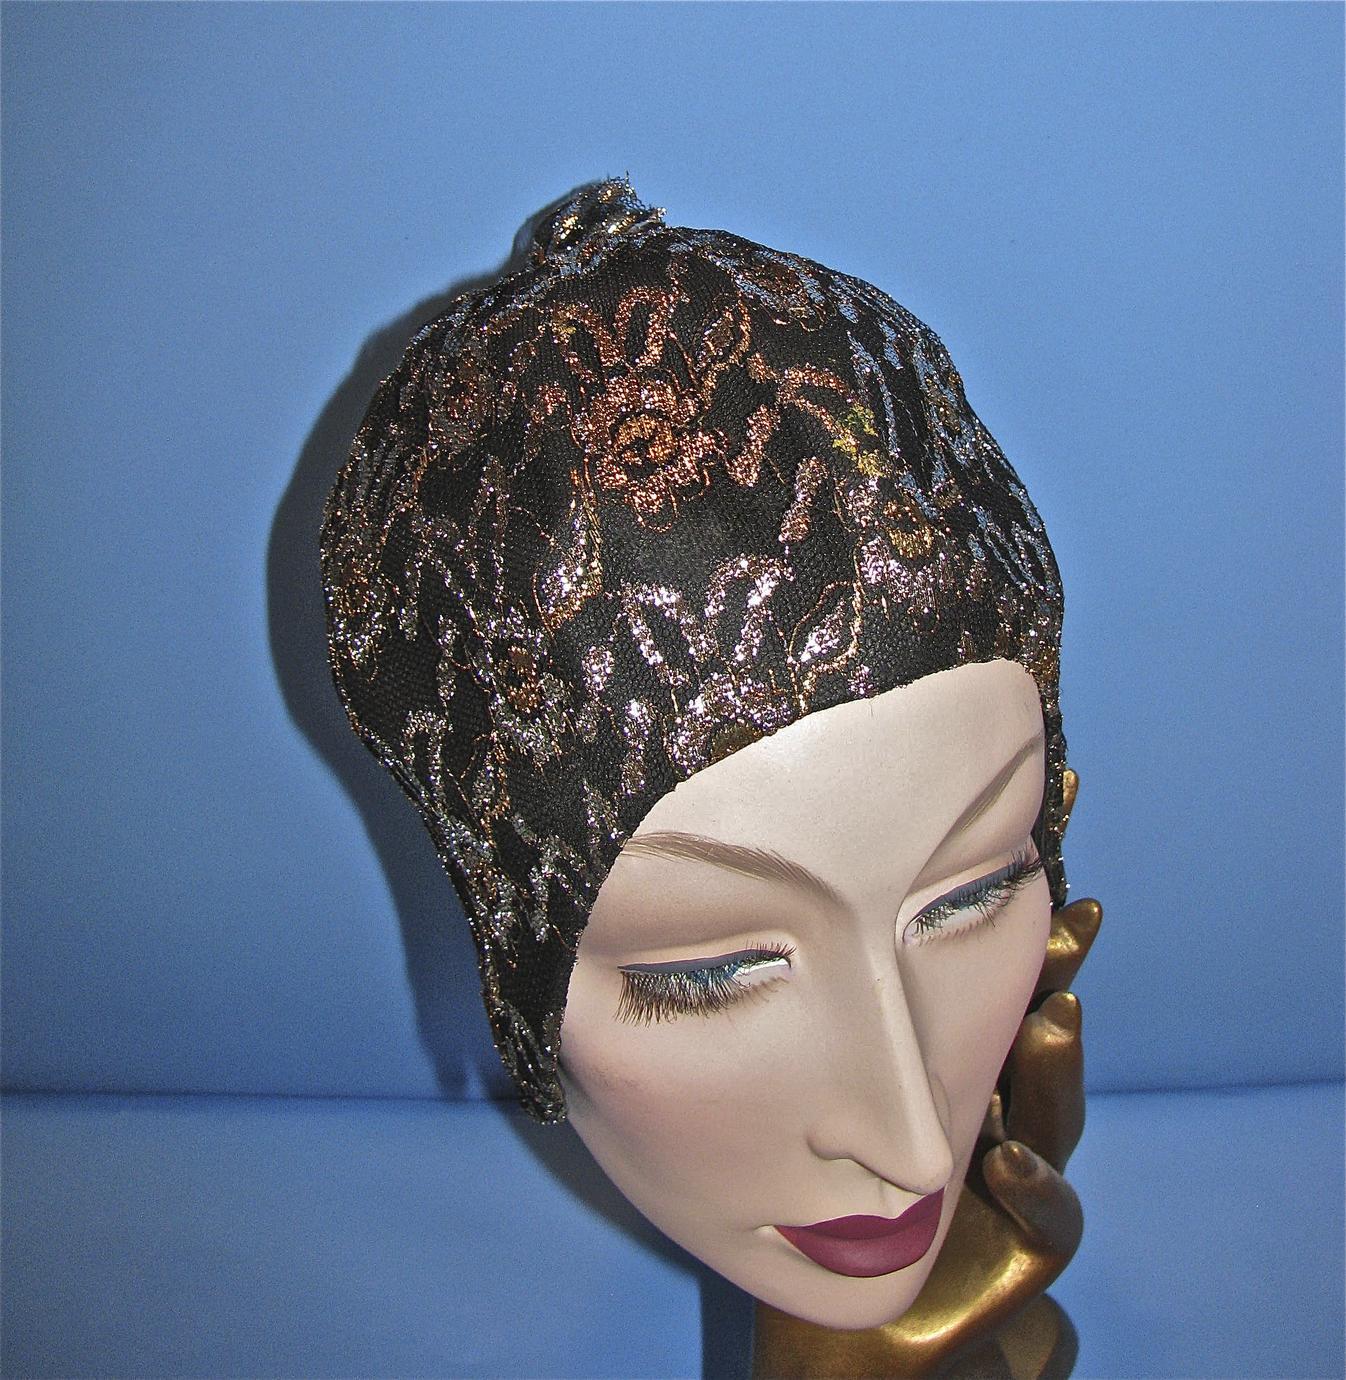 Black rubber cap